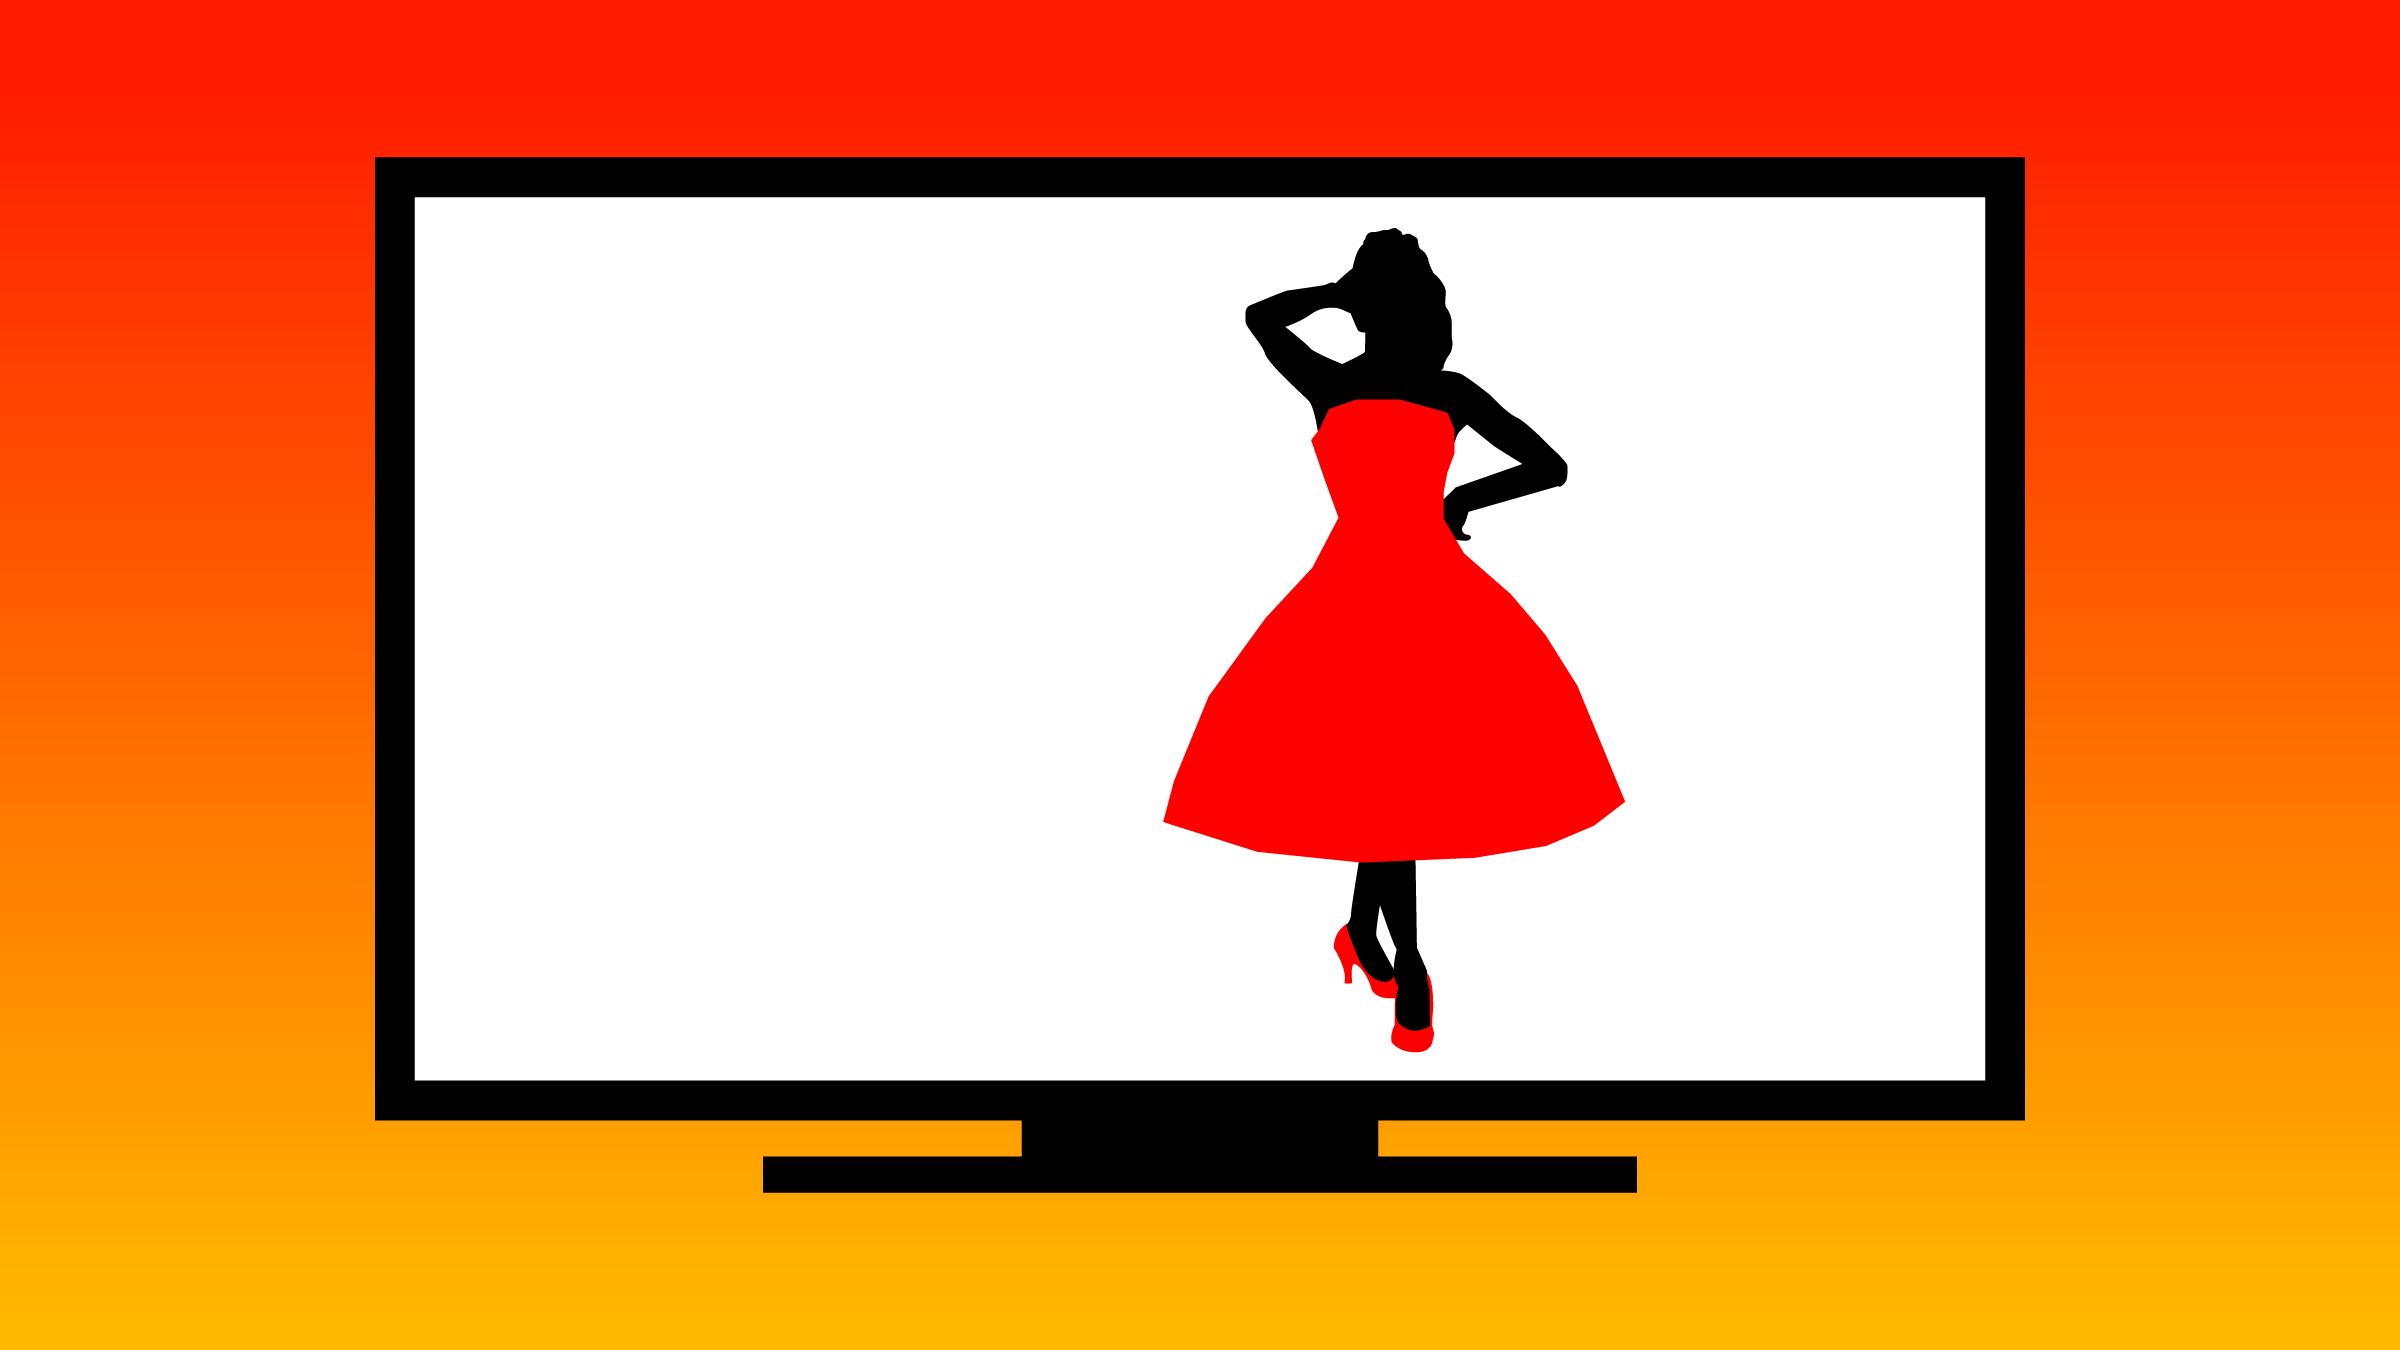 echo-sees-dress@2x